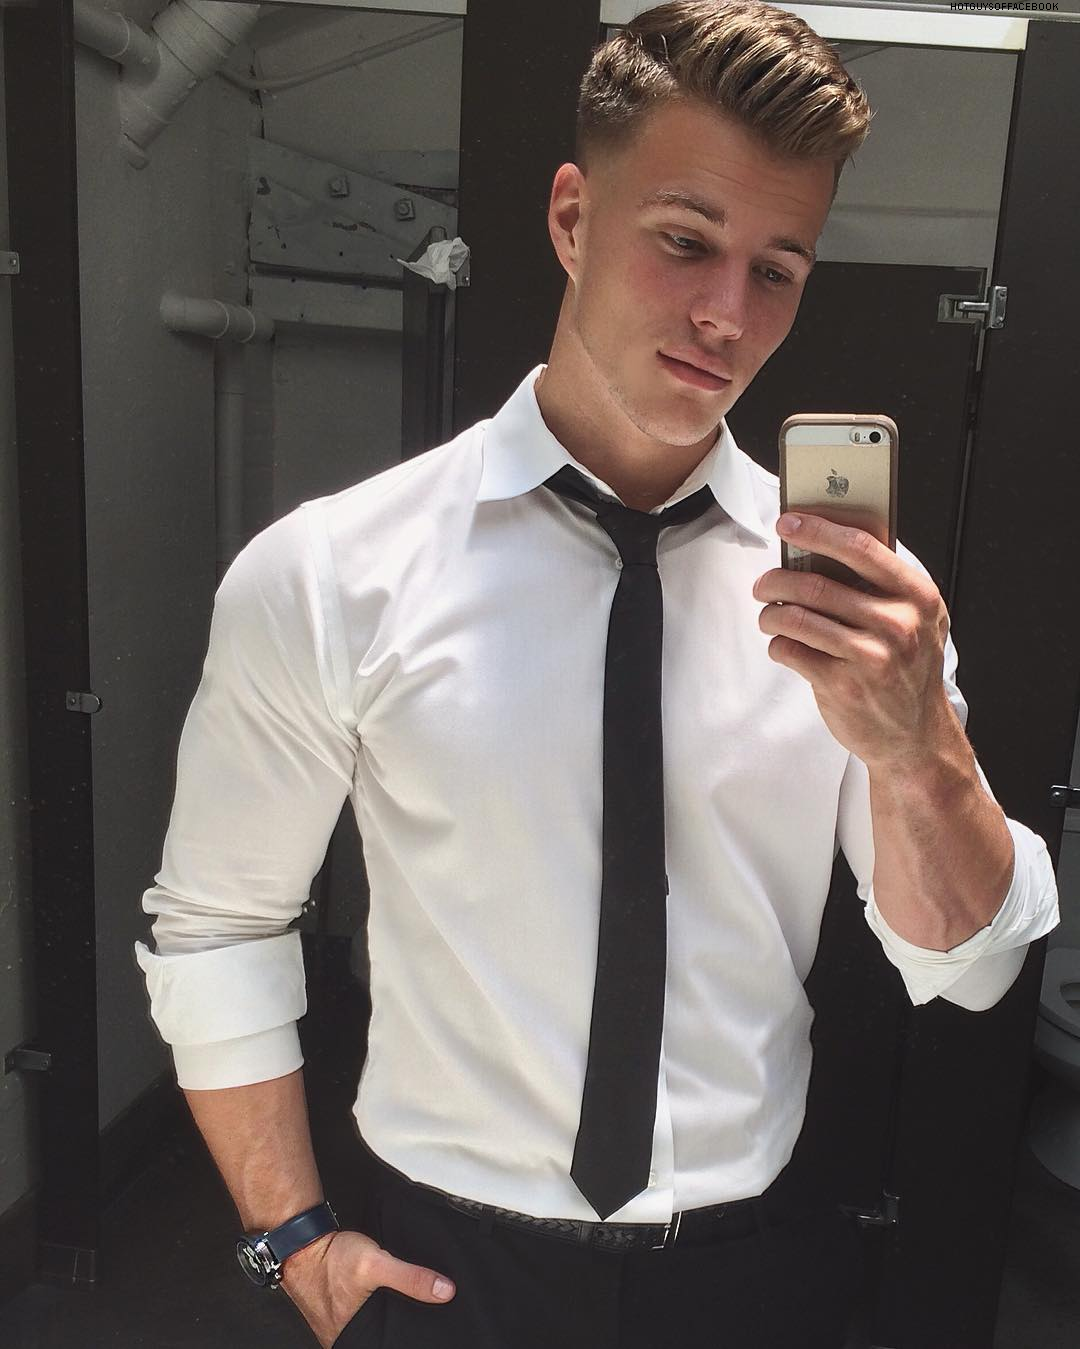 Classy mens haircuts schöne men  hot selfies  pinterest  football team sexy guys and guy